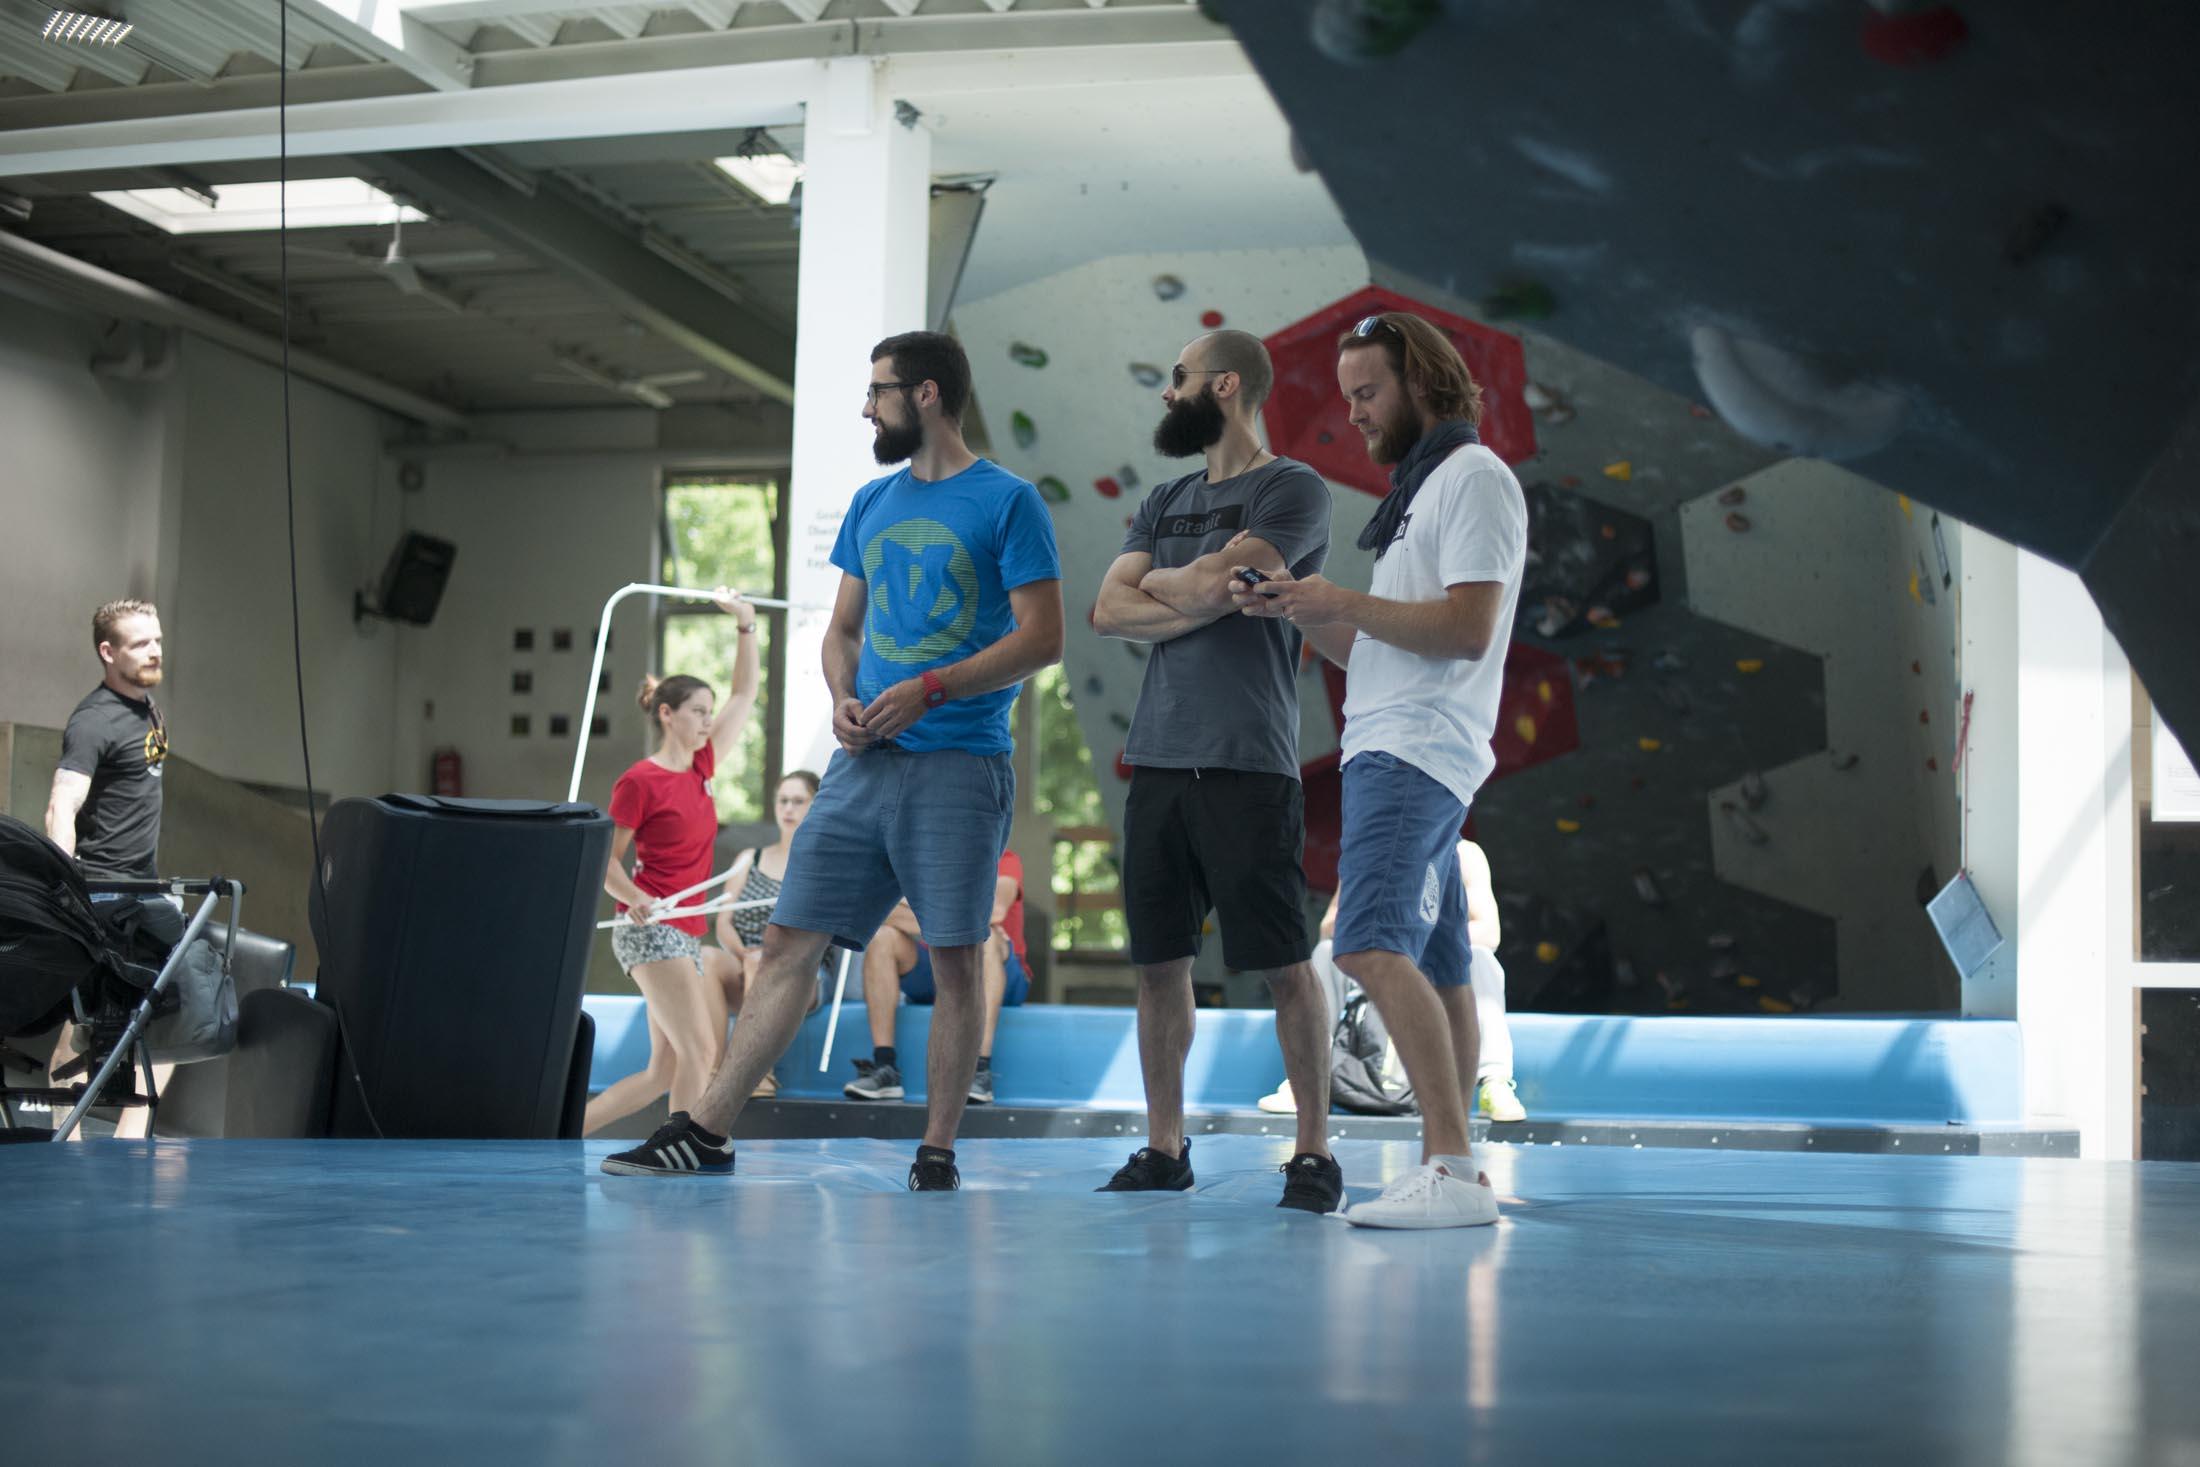 Registration internationaler bouldercup Frankenjura 2016, BLOCKHELDEN Erlangen, Mammut, Bergfreunde.de, Boulderwettkampf07092016059